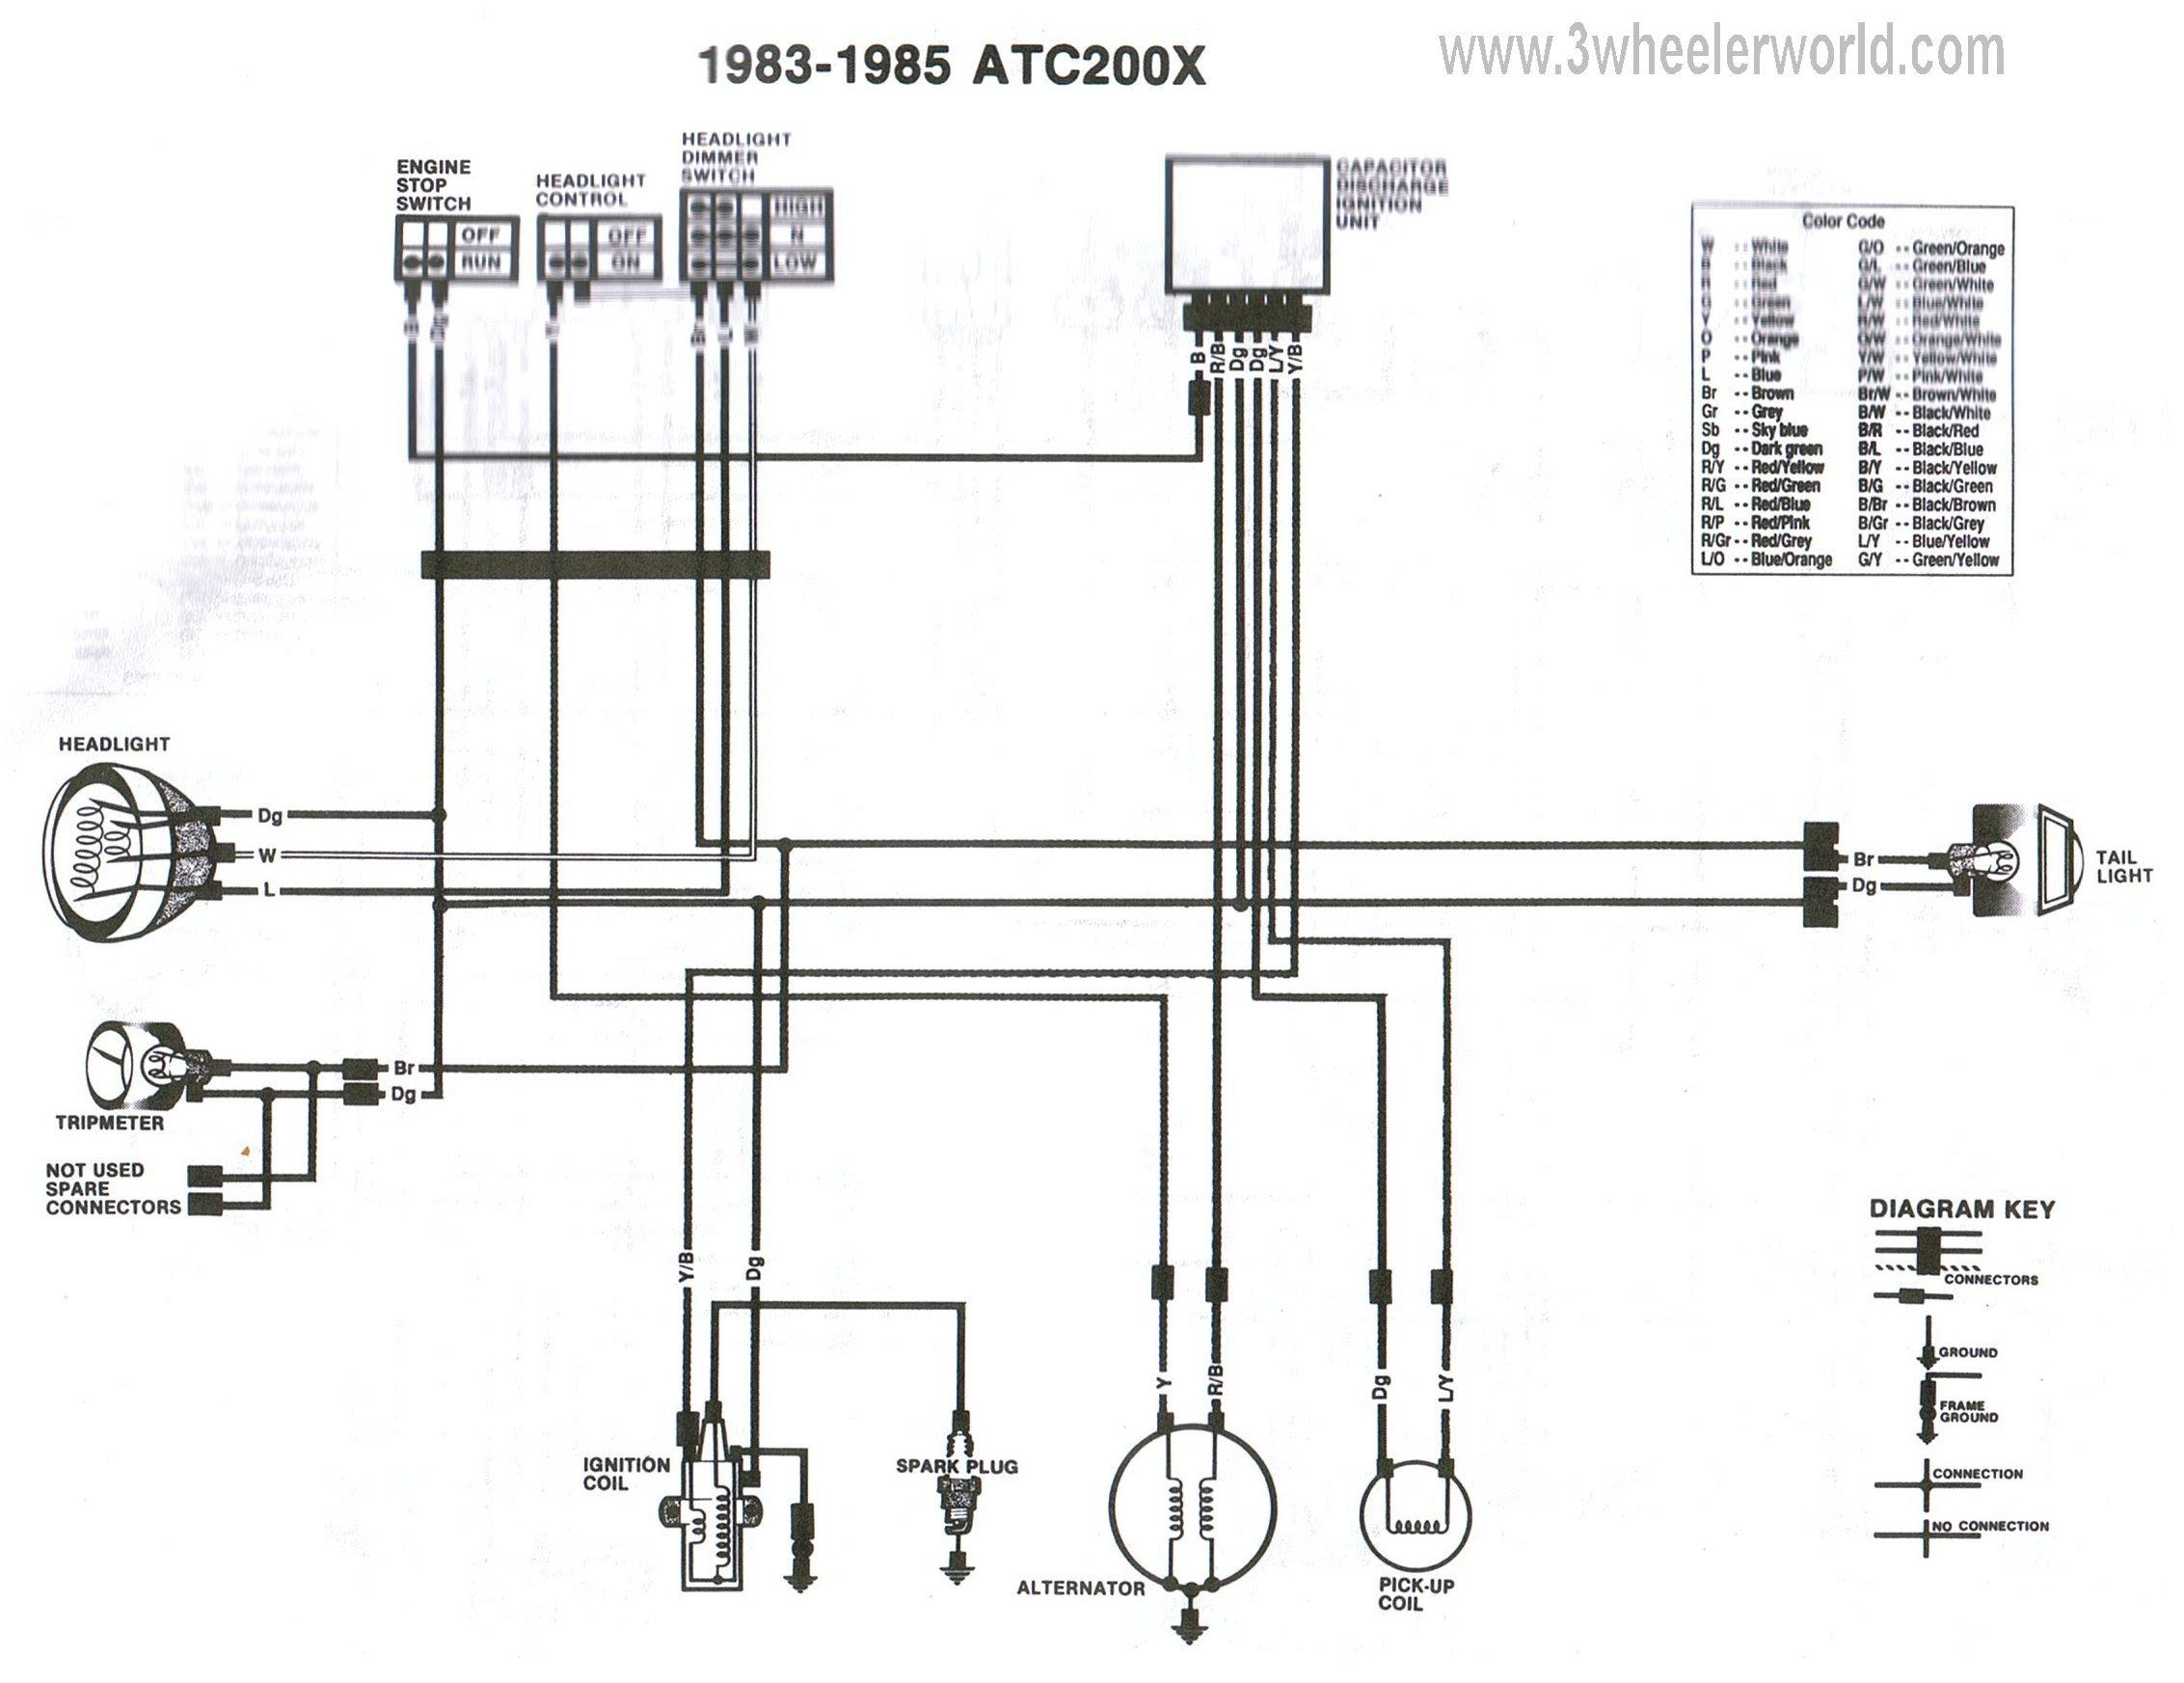 Wiring Diagram For Honda Trx300ex